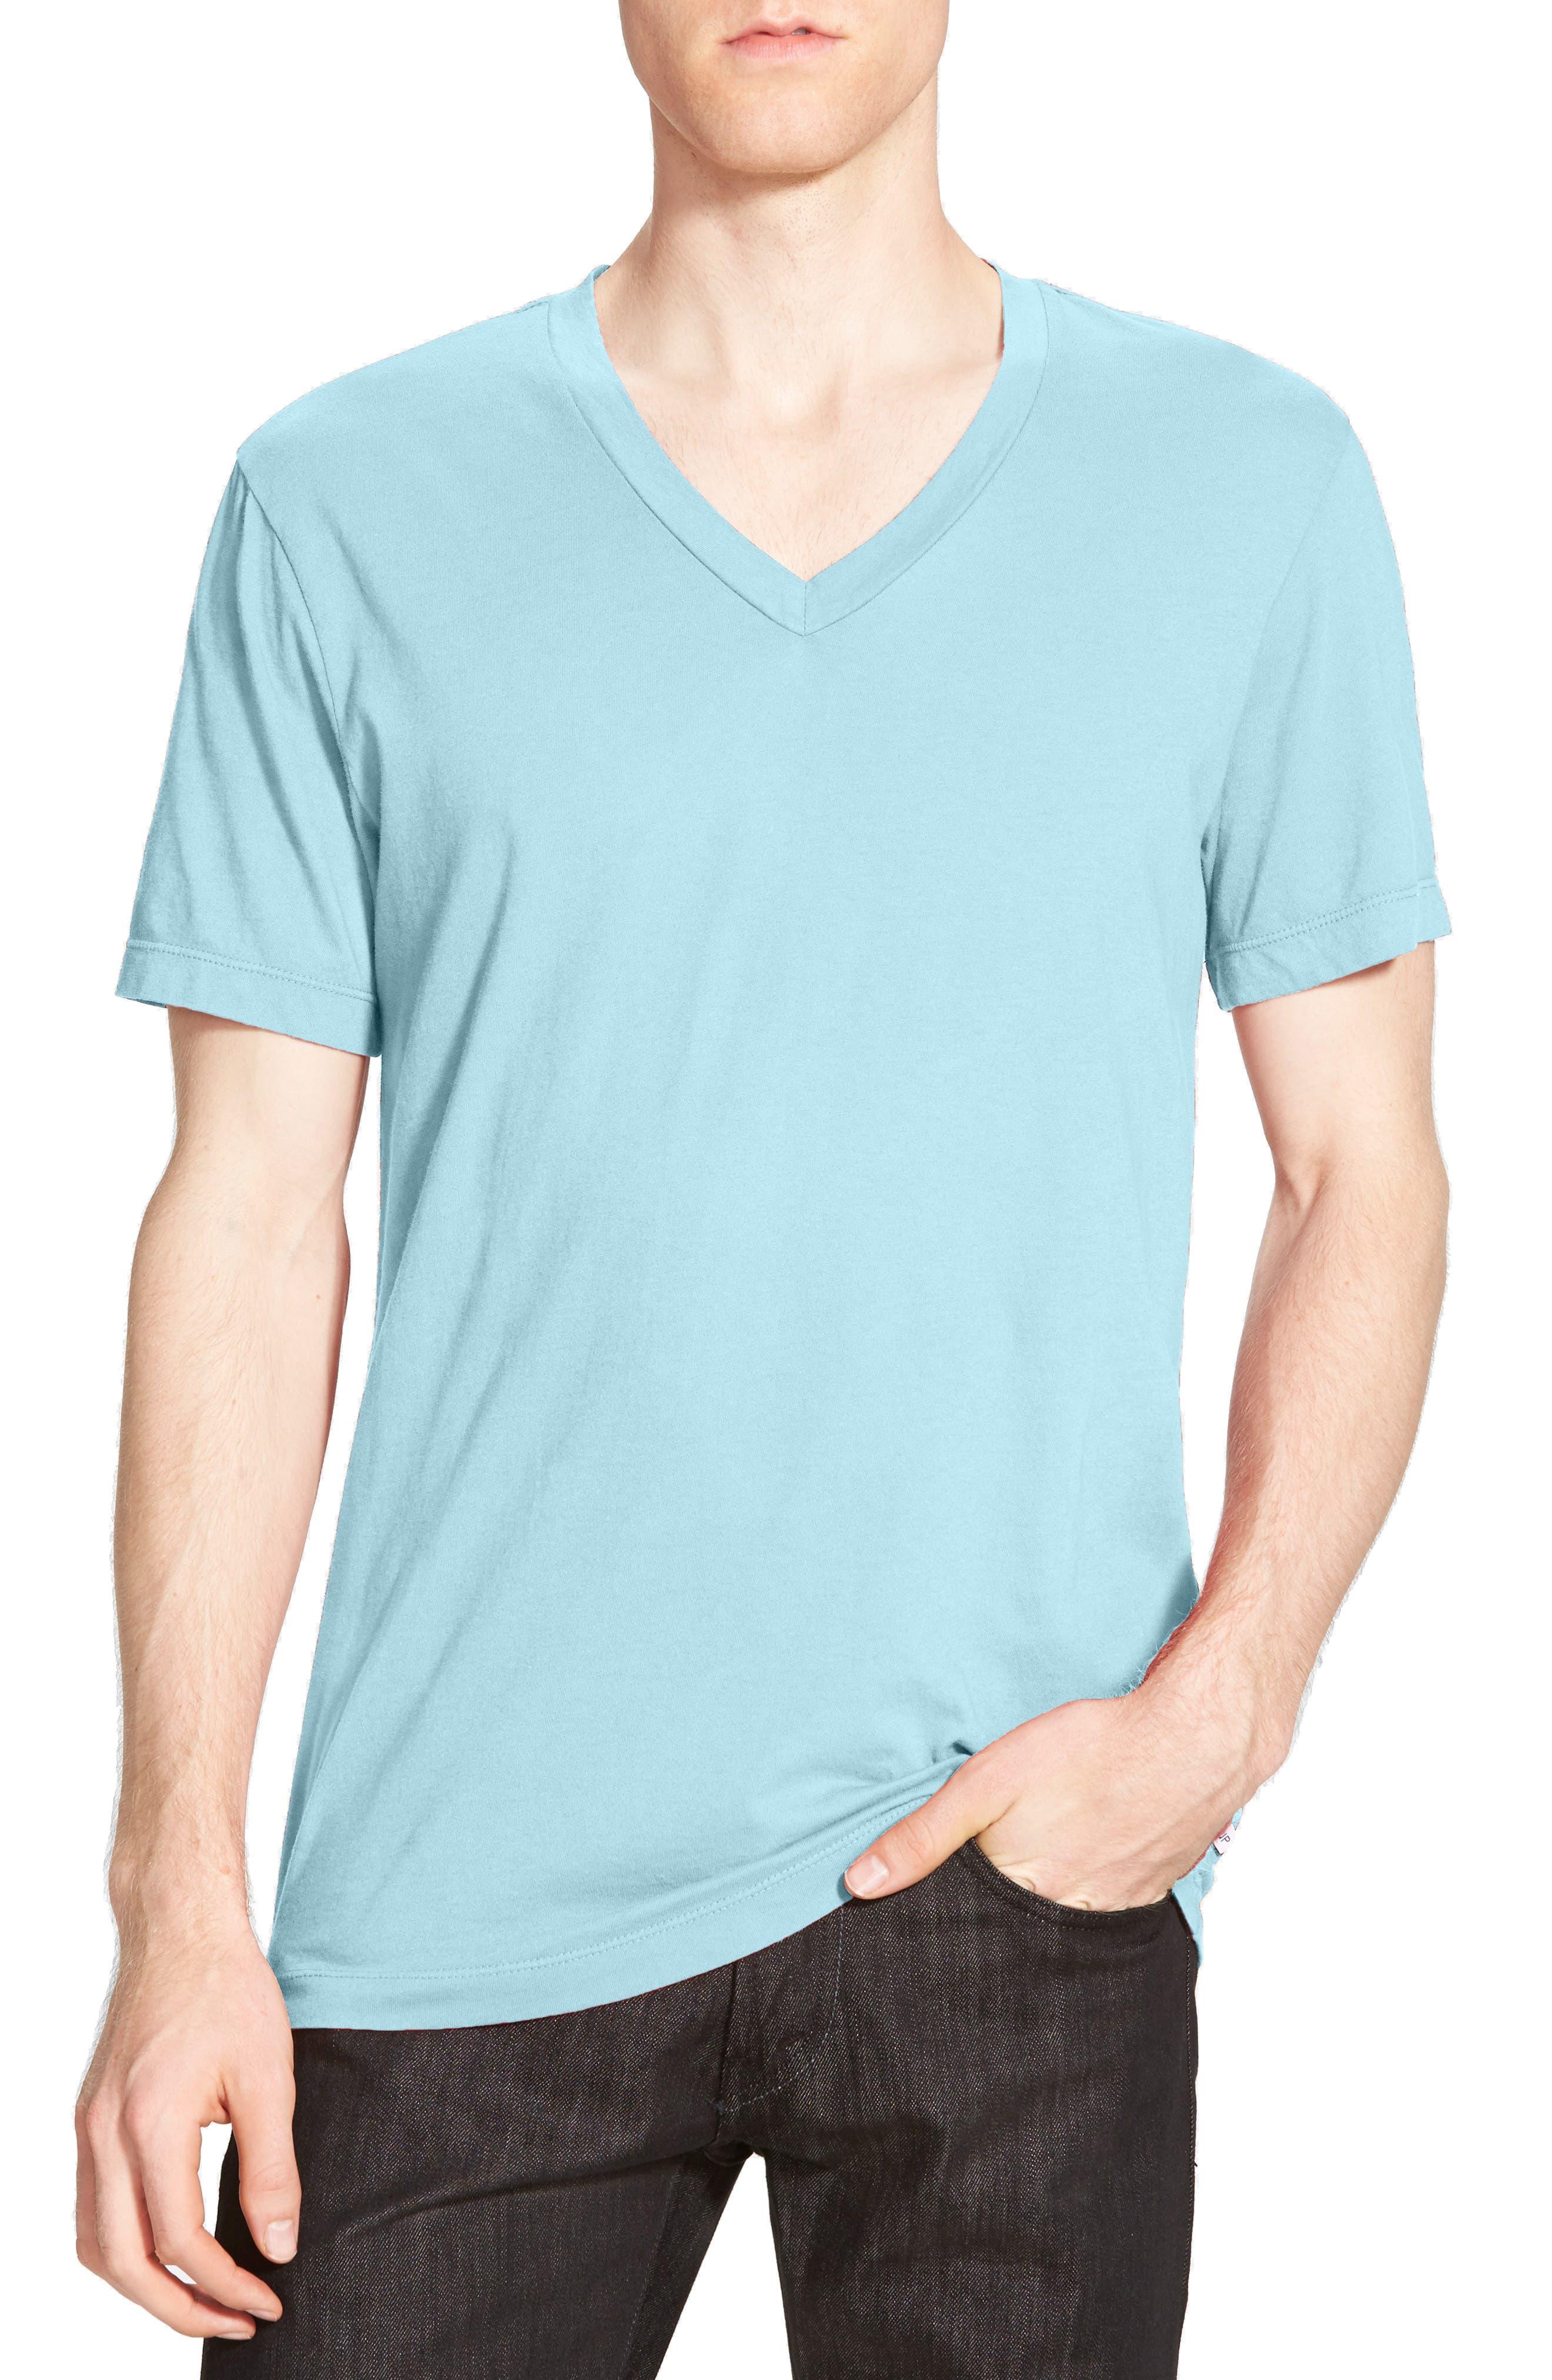 Alternate Image 1 Selected - James Perse Short Sleeve V-Neck T-Shirt